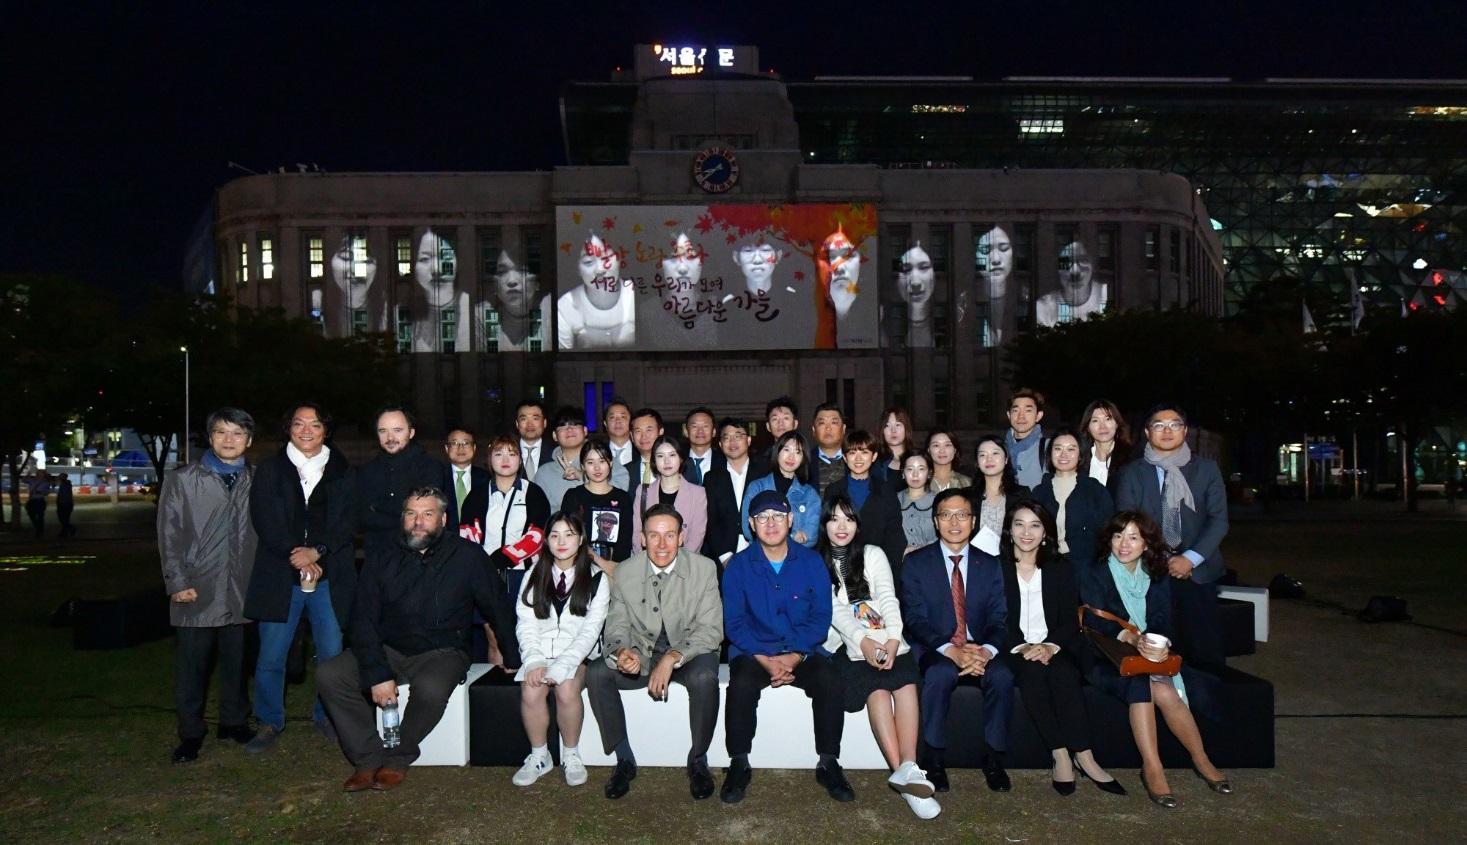 R:\ClientServing\Han Sung Motor\16. Photo\2018.10.02 SFAC 서울거리예술축제 행사\선별\보도자료 최종\181002[사진3]_rs.jpg